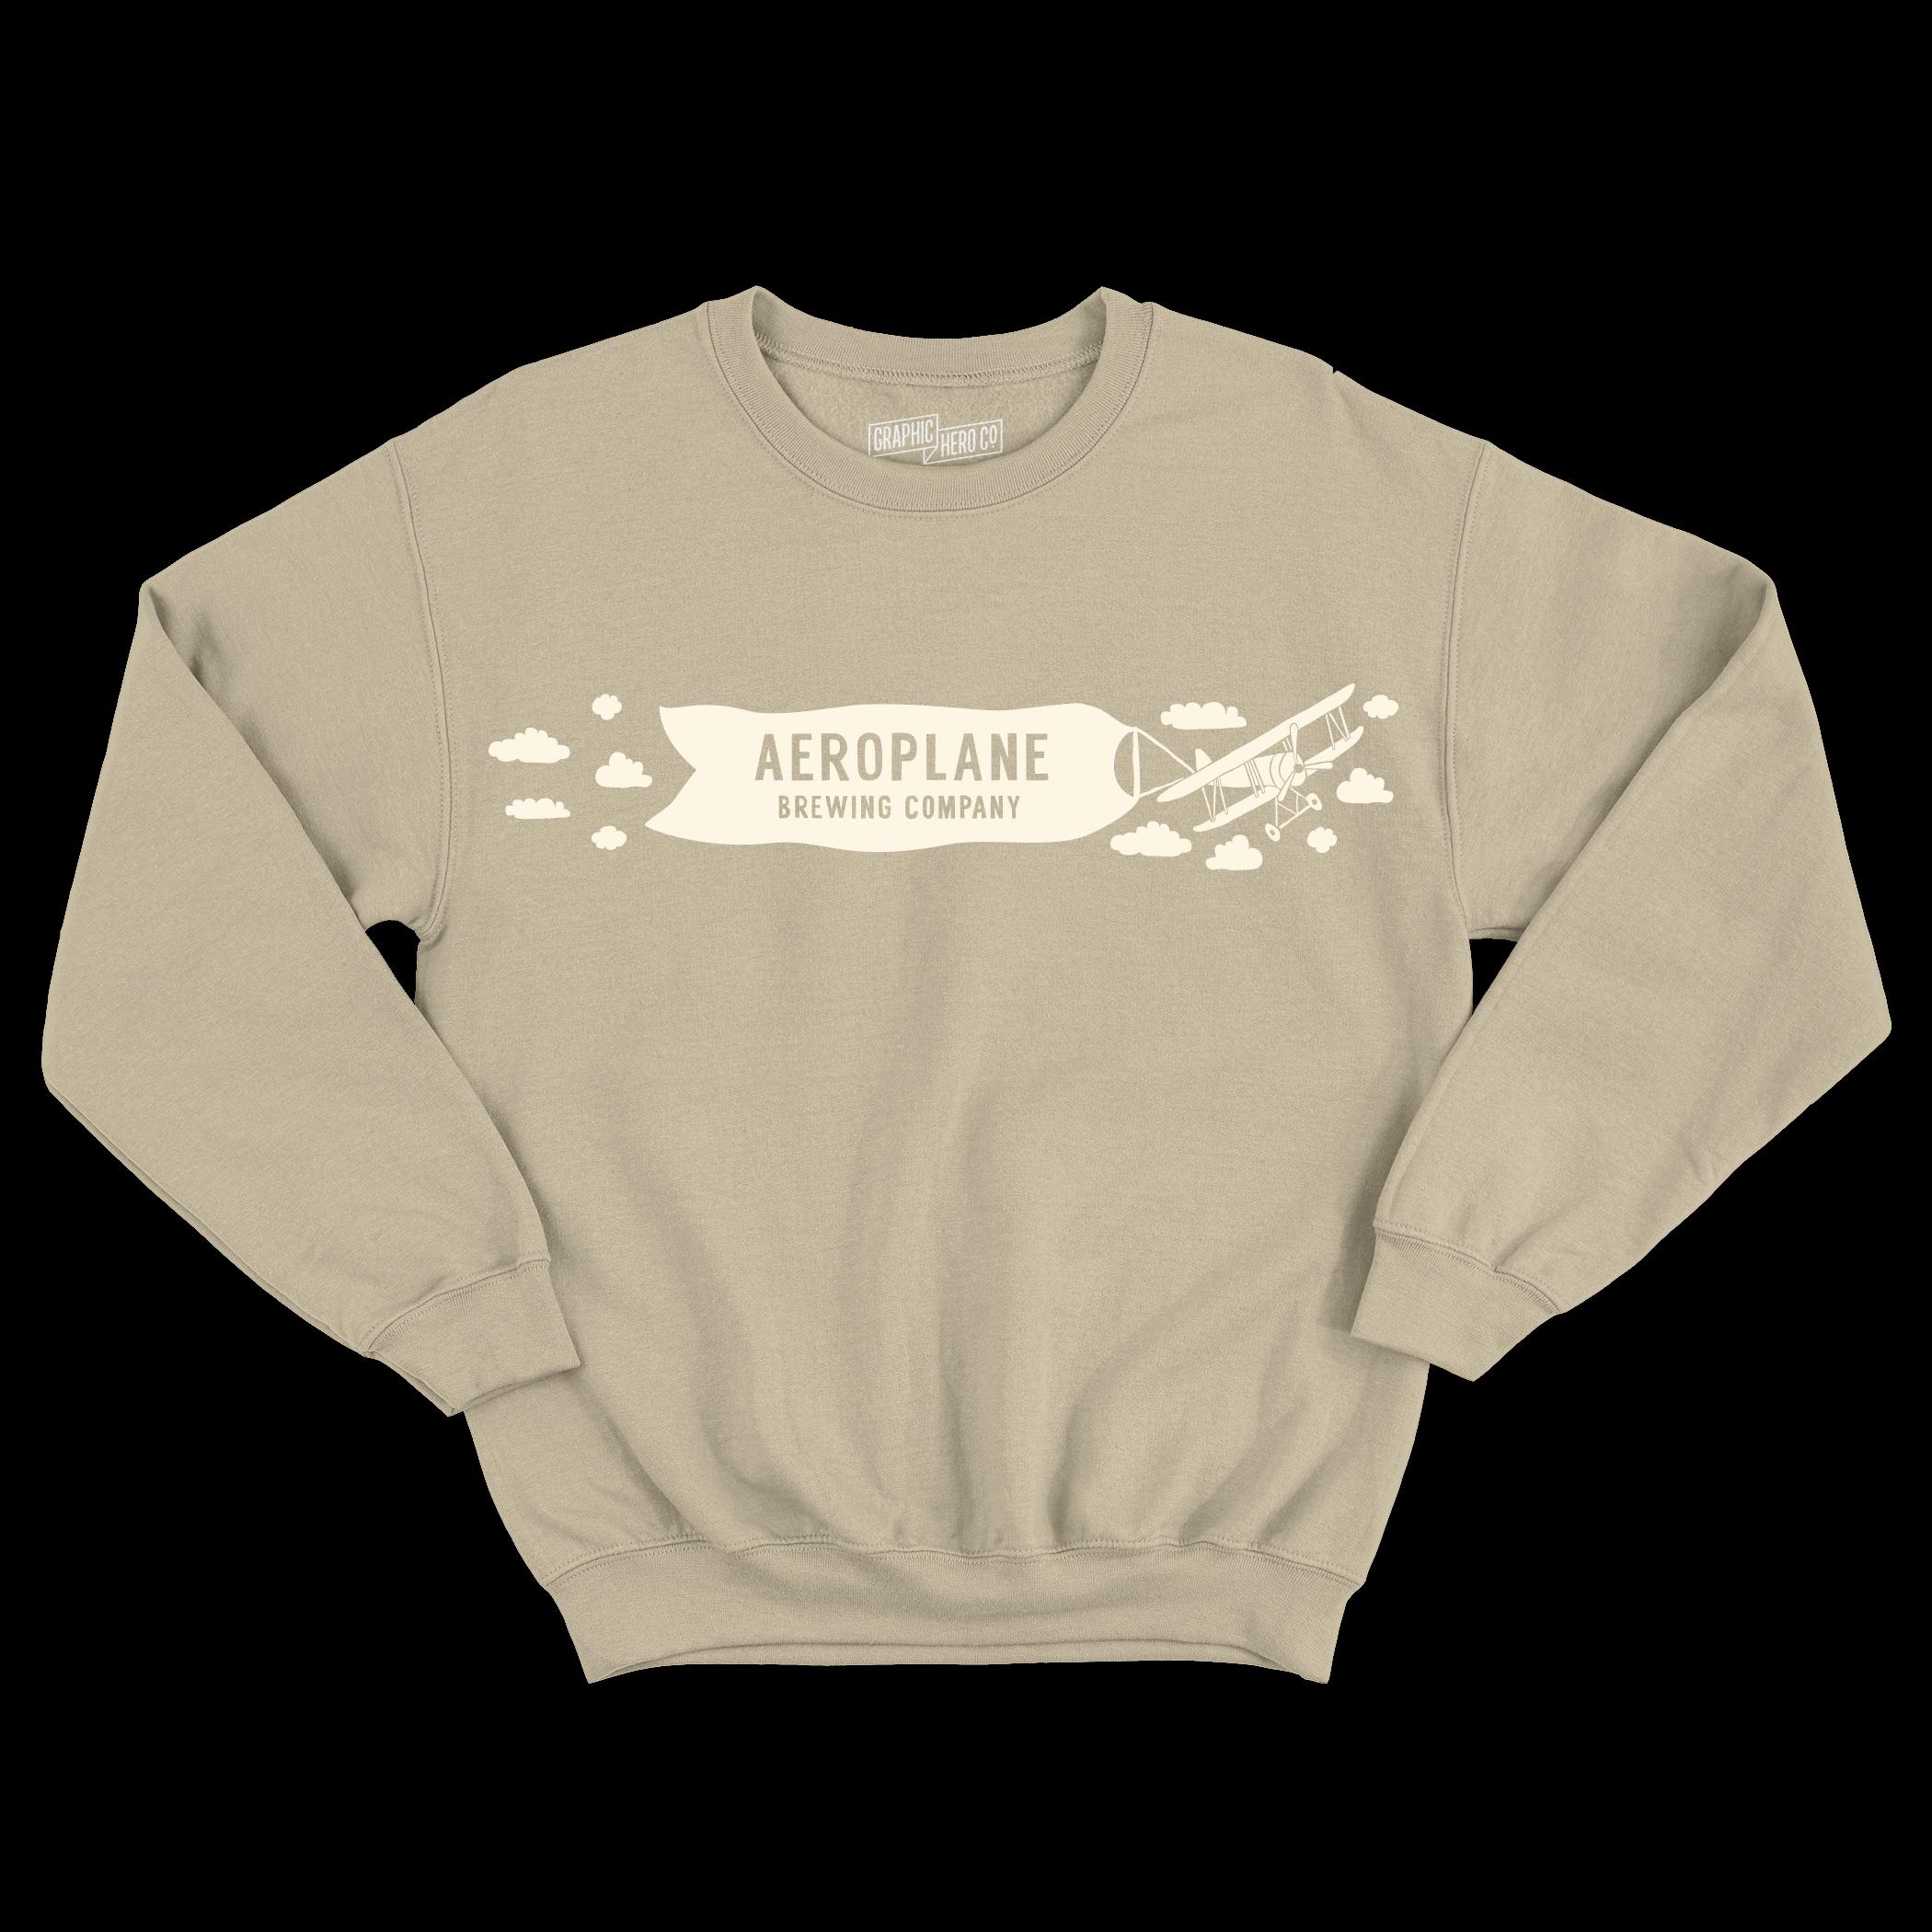 AEROPLANE_SILKSCREEN_SWAG_SM_053018_V1_sweatshirt1